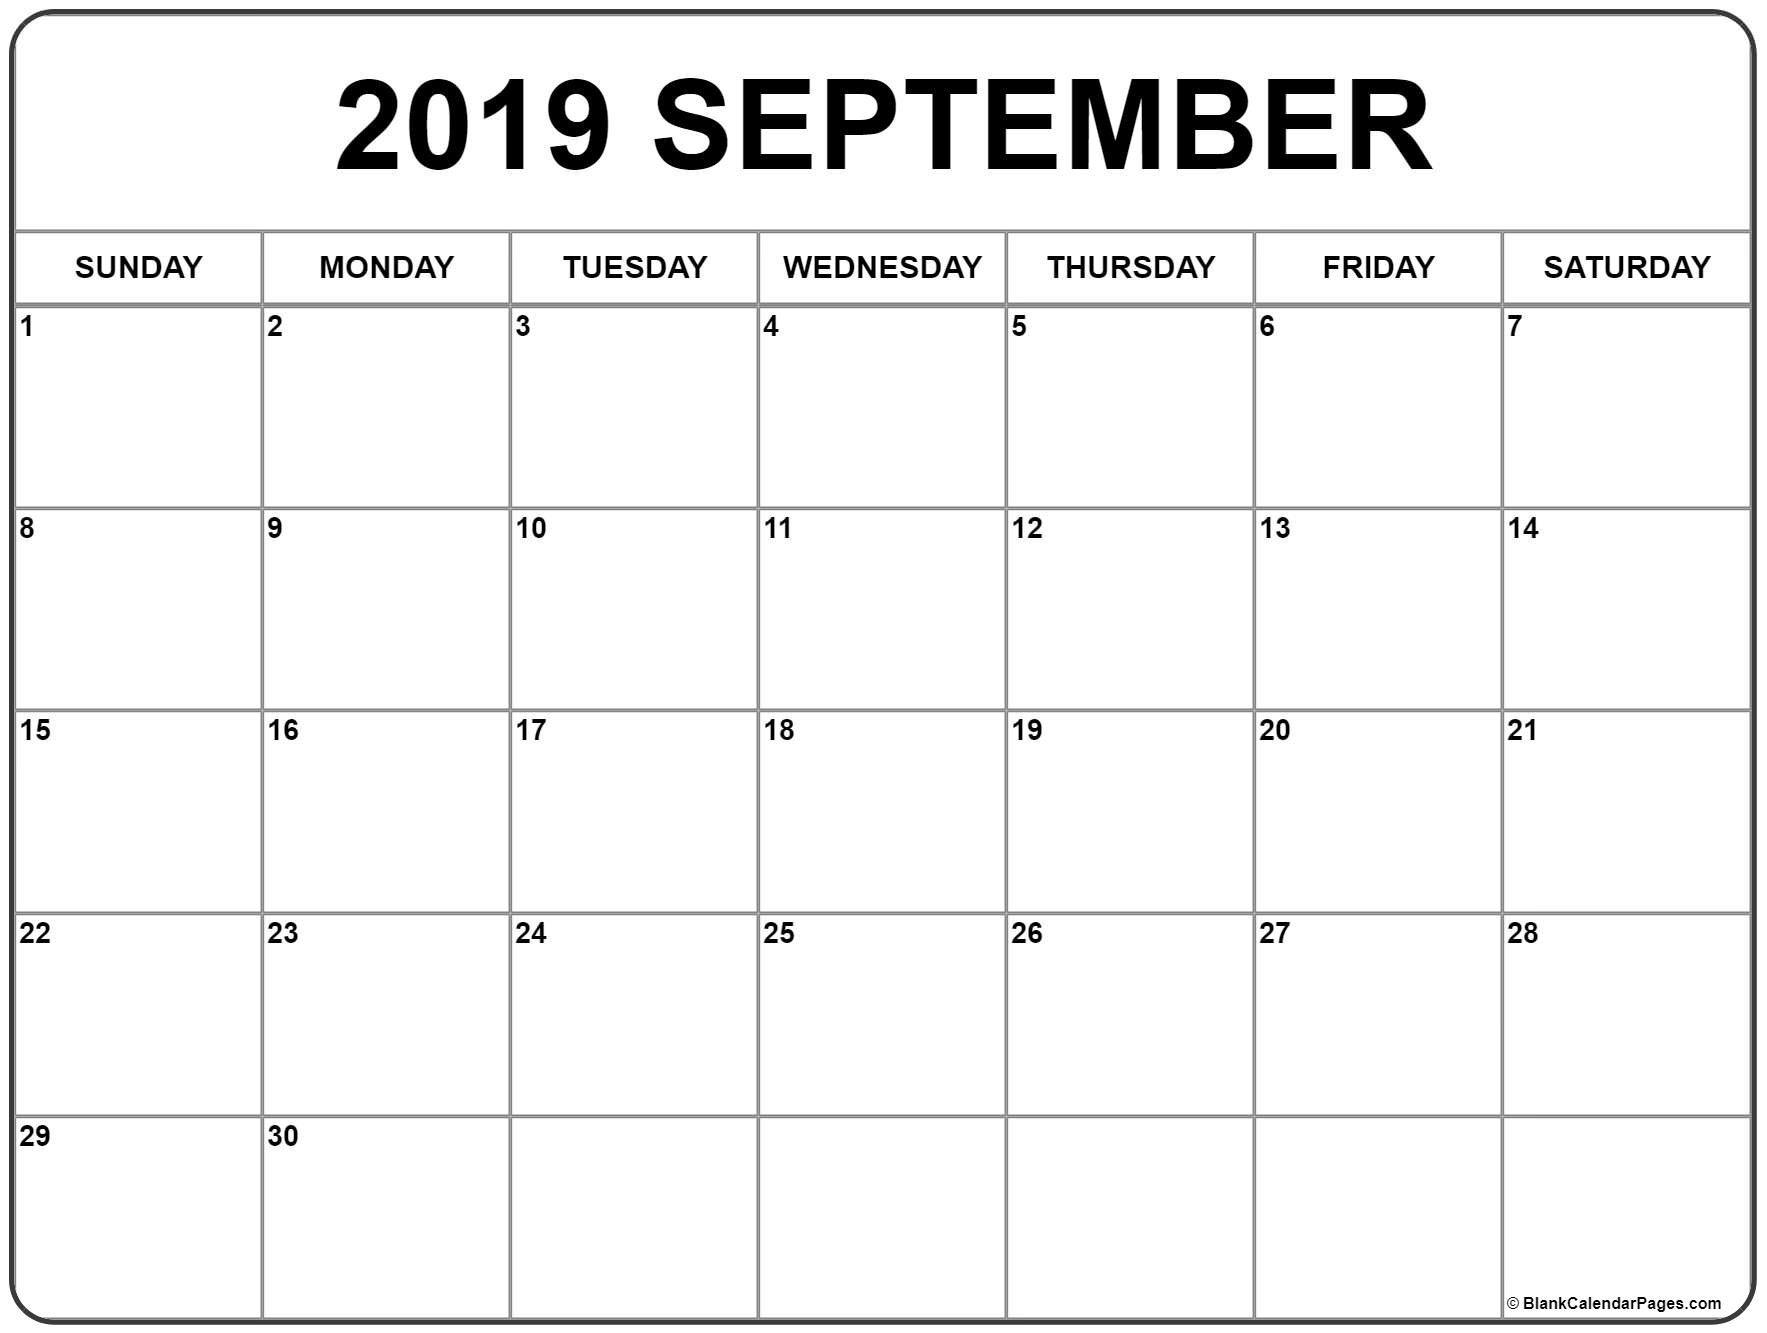 September 2019 Calendar | 56+ Templates Of 2019 Printable Calendars Calendar 2019 September